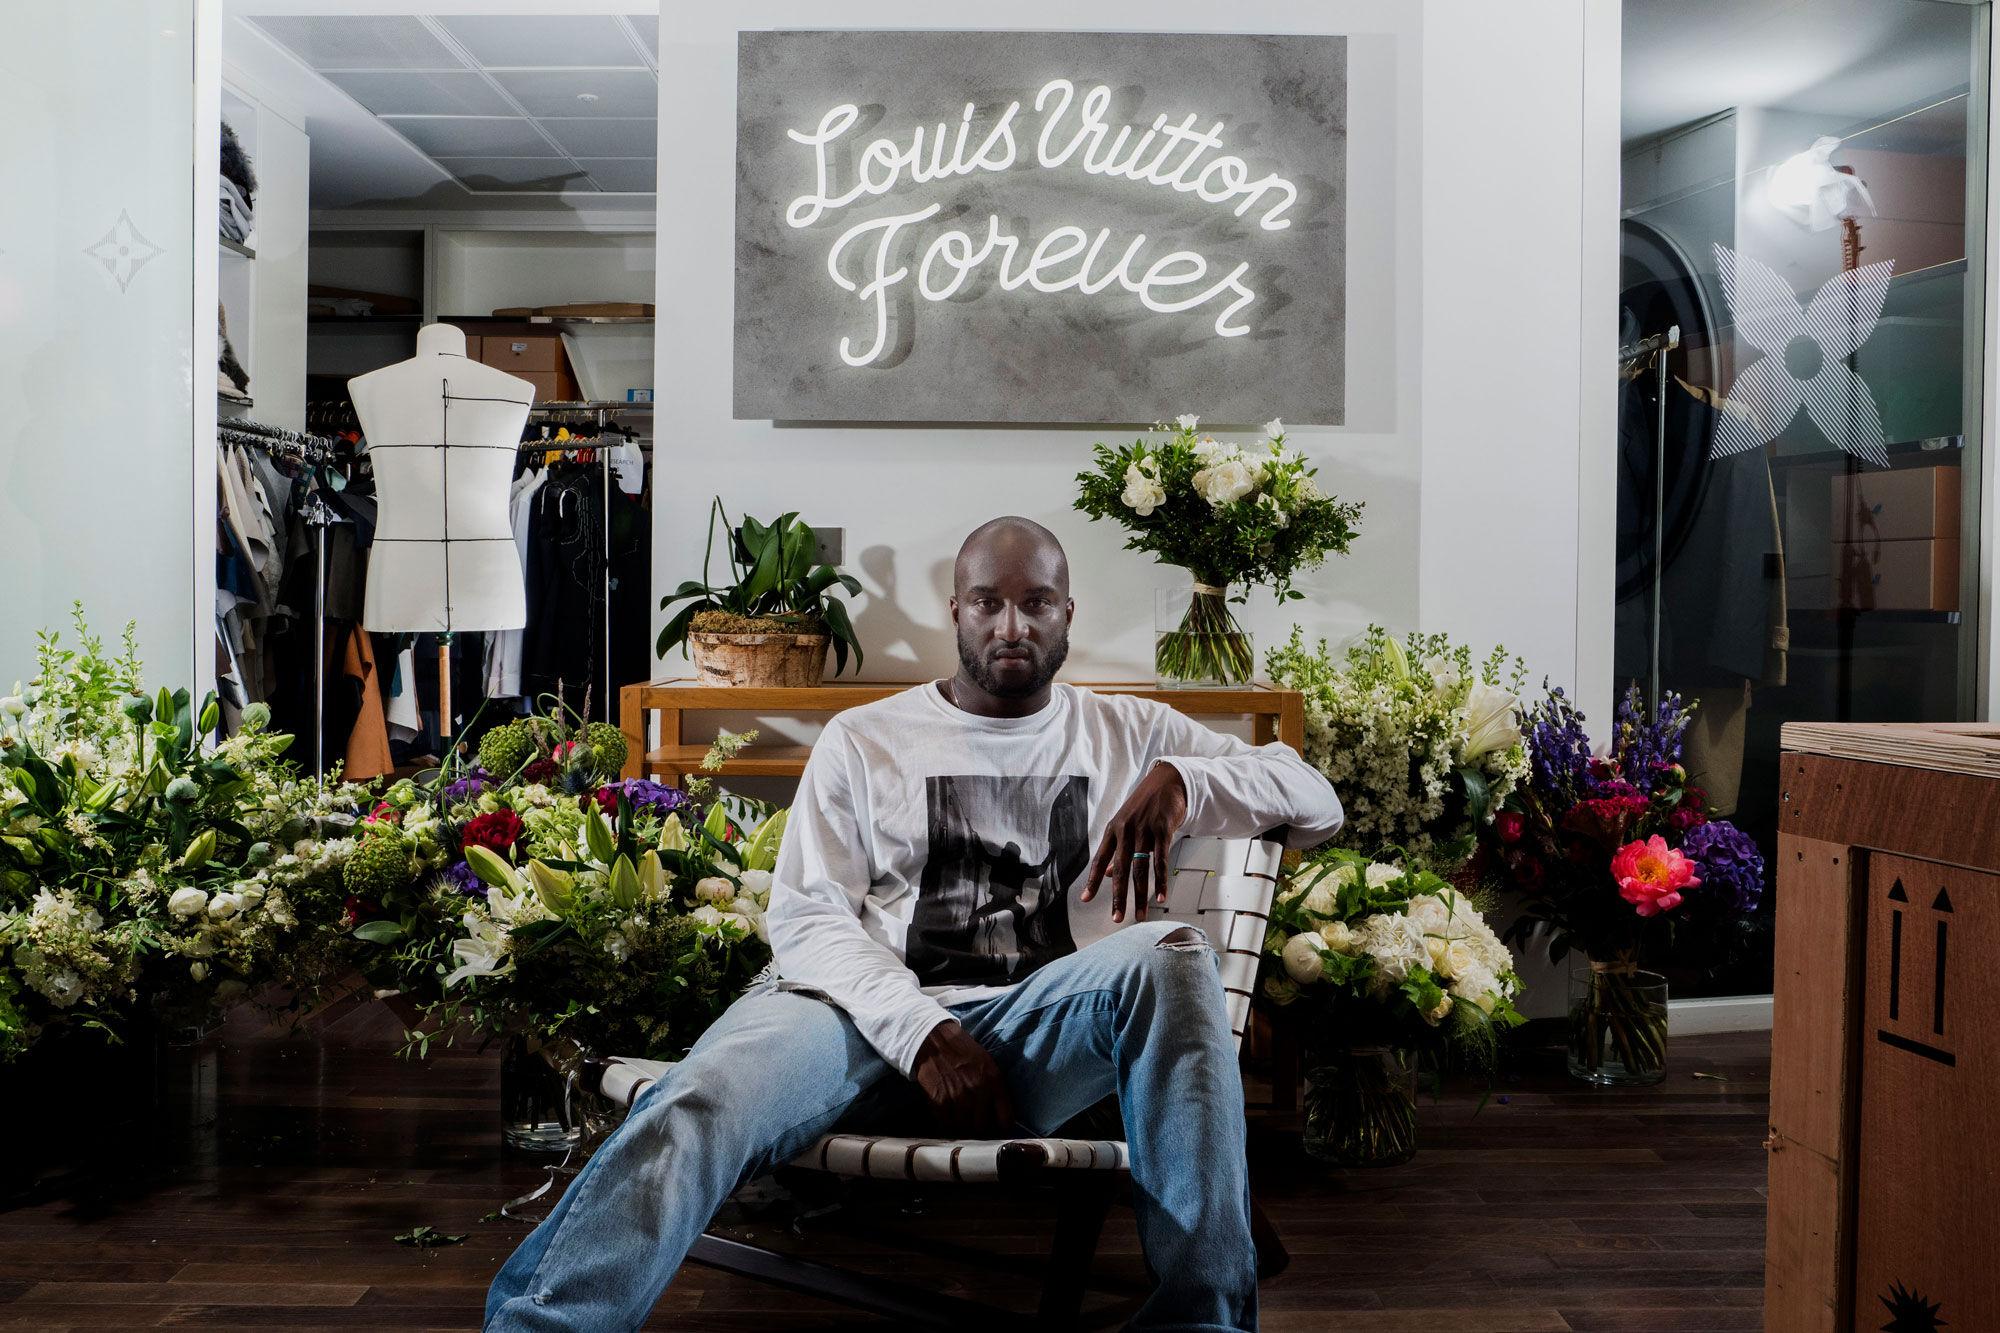 Portrait of Virgil Abloh at the Louis Vuitton headquarters © Alex Majoli/Magnum Photos. Courtesy of Magnum Photos.